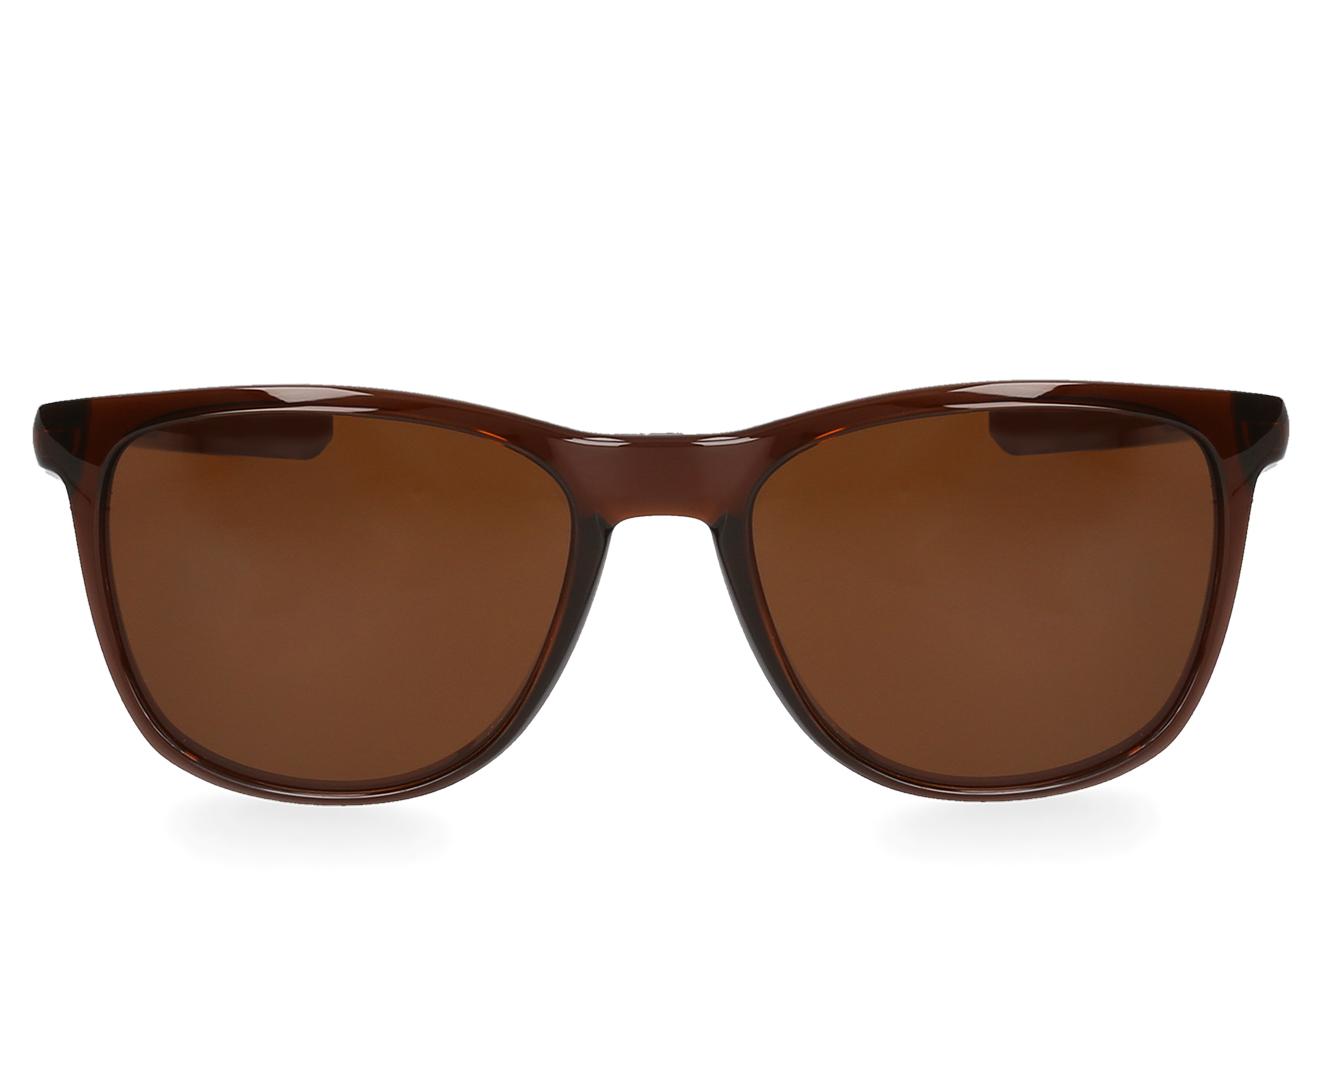 6ccfee68e6d Oakley Men s Trillbe X Sunglasses - Polished Rootbeer Dark Bronze